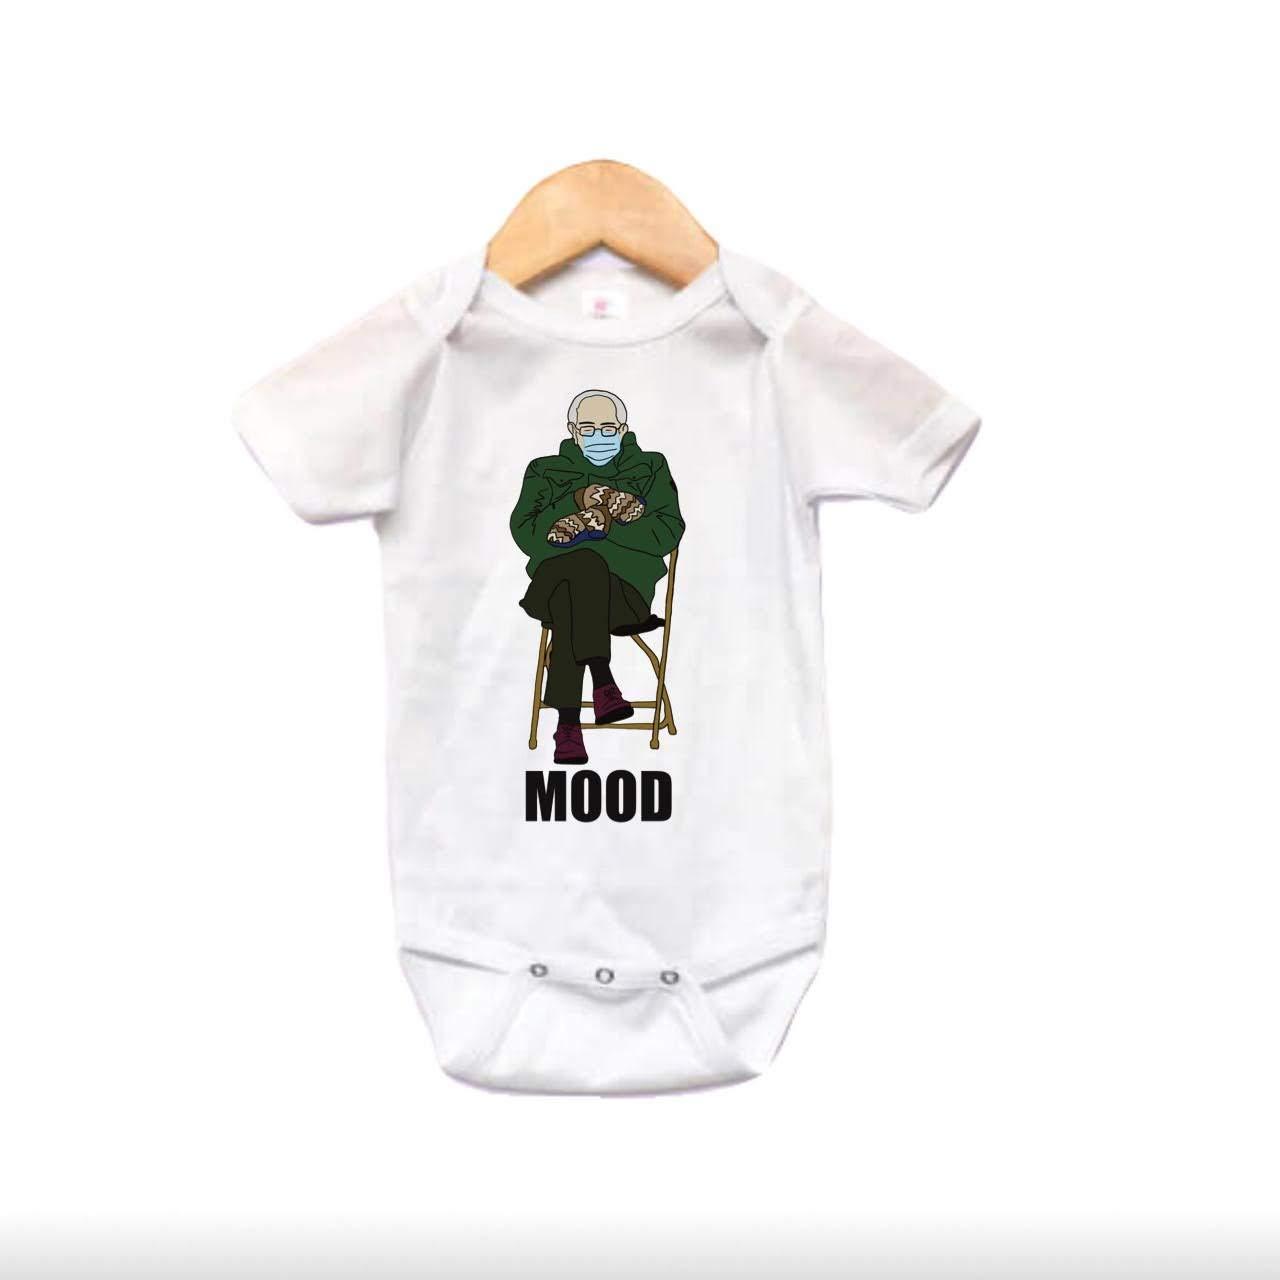 Bernie Sanders mittens baby bodysuit Genuine Free Shipping shopping